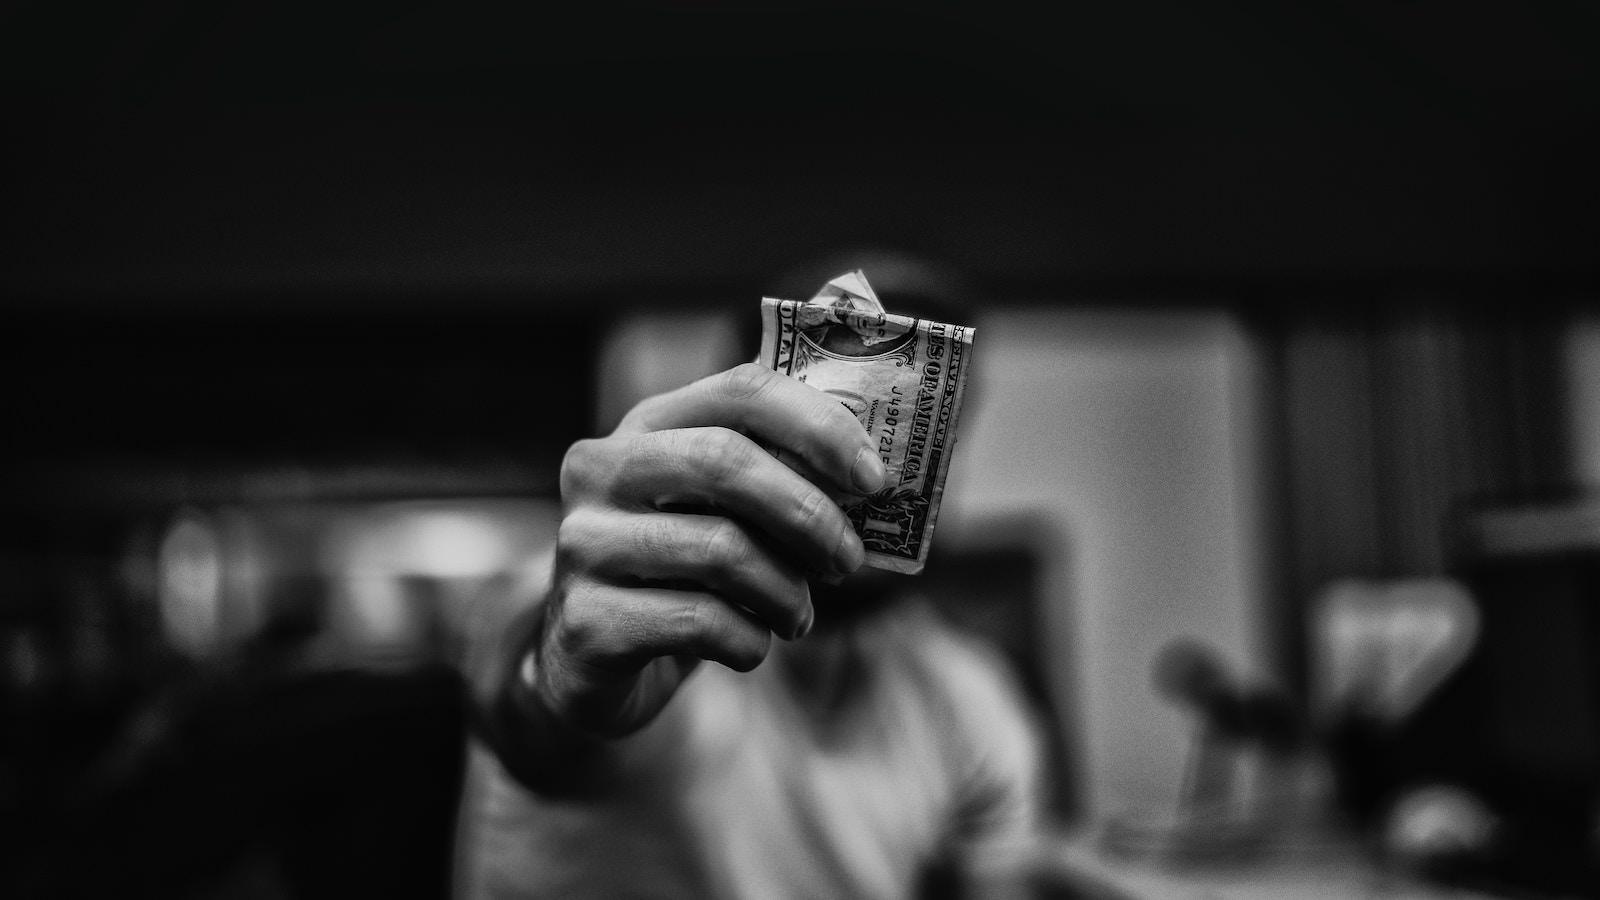 Lucas favre 489526 unsplash paying money